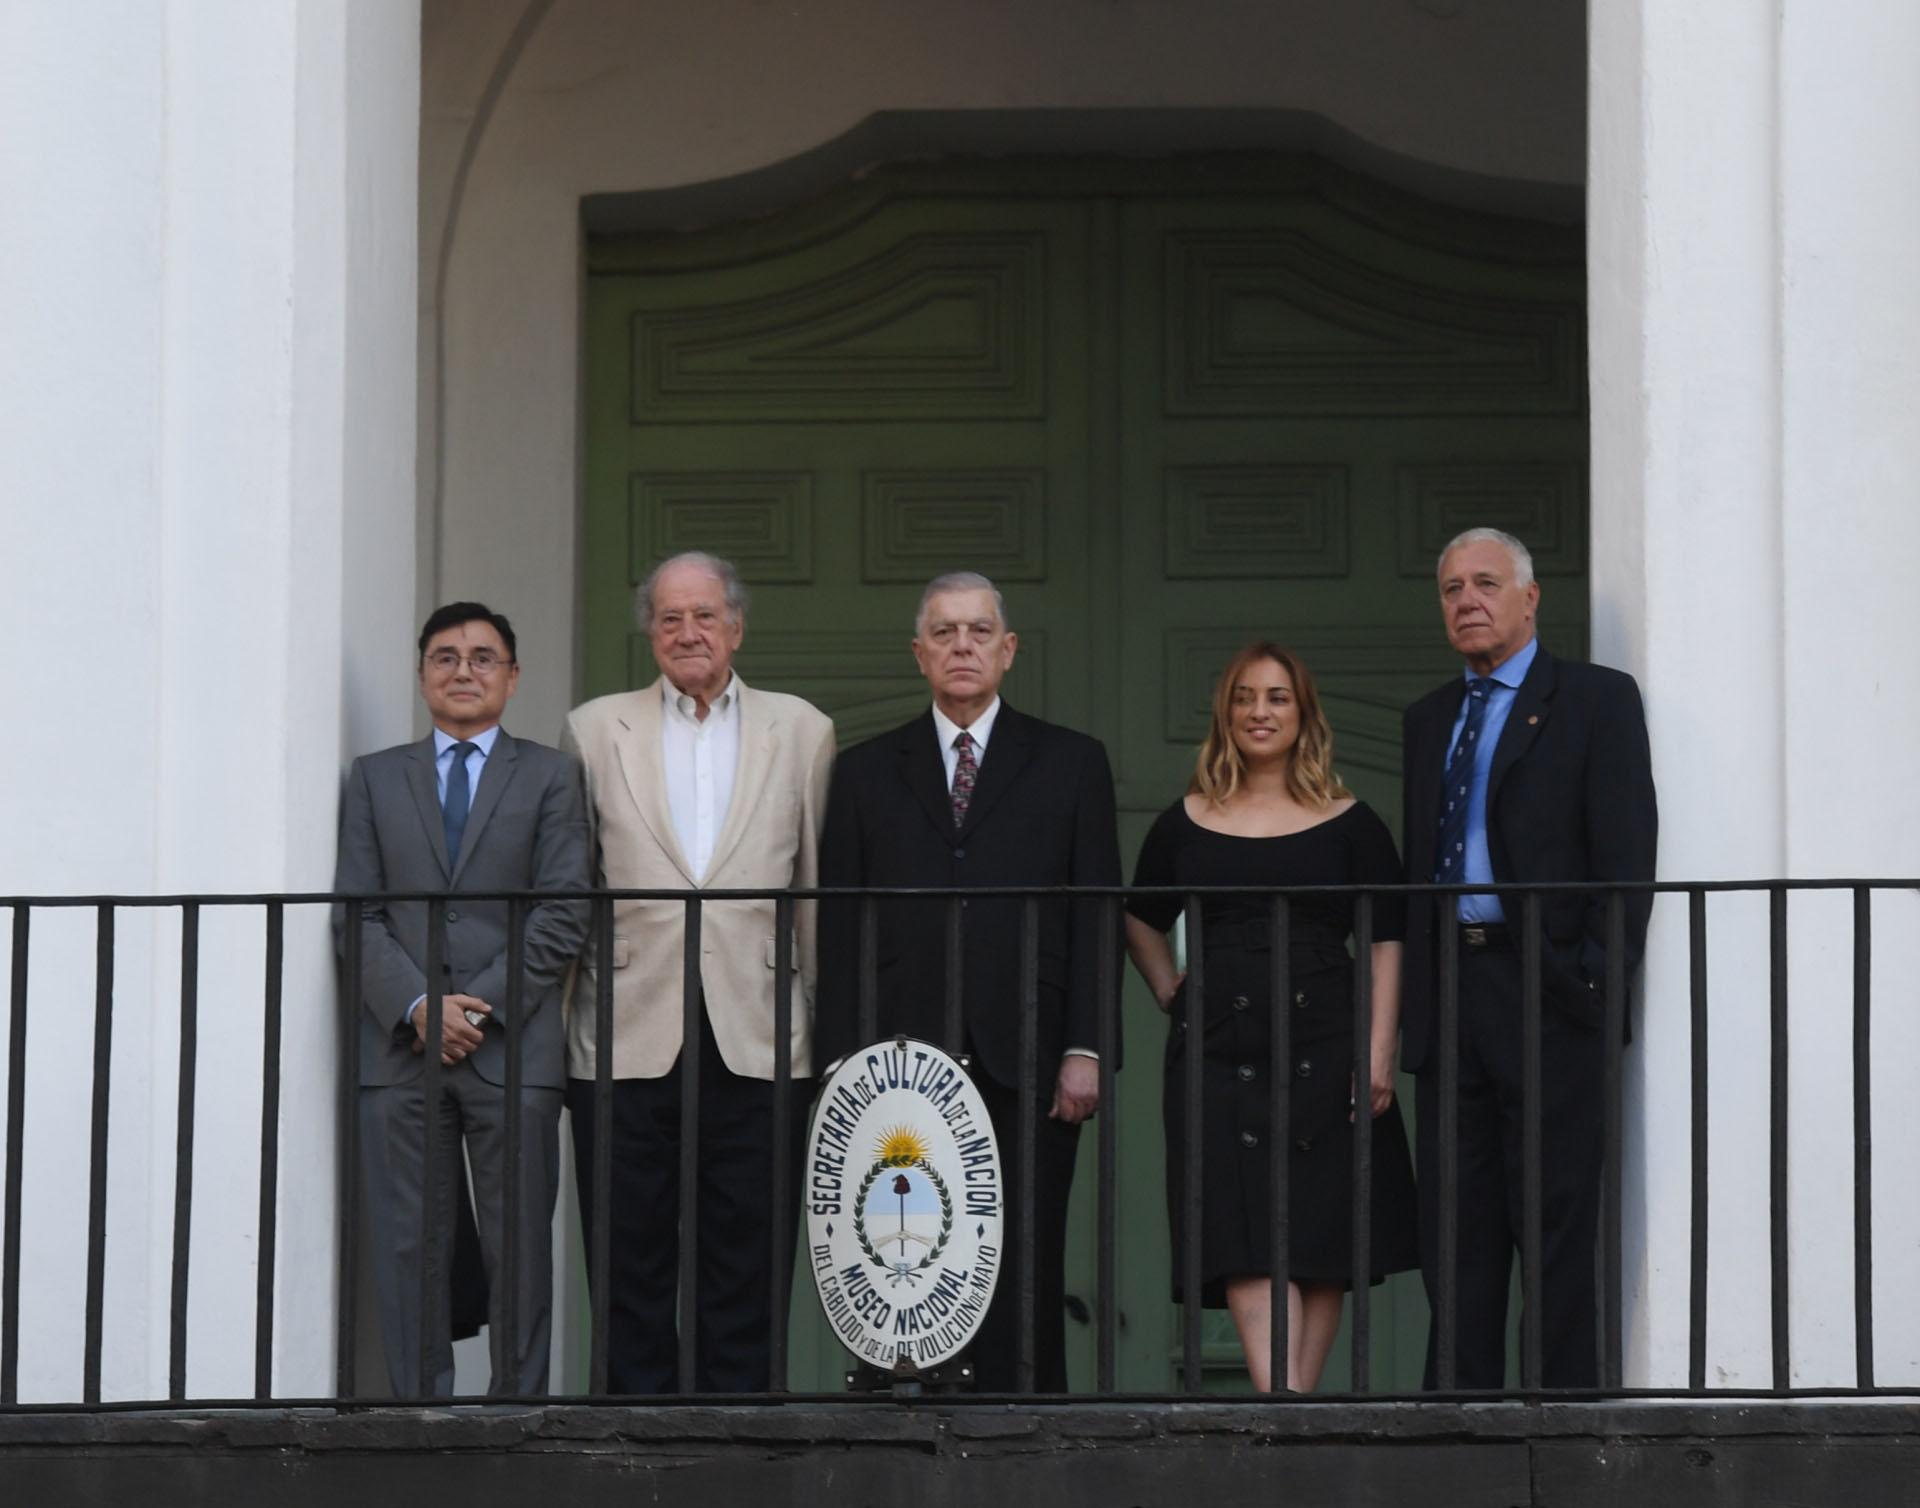 Fontevecchia, Cox, Biasatti, Oliván y Campolongo